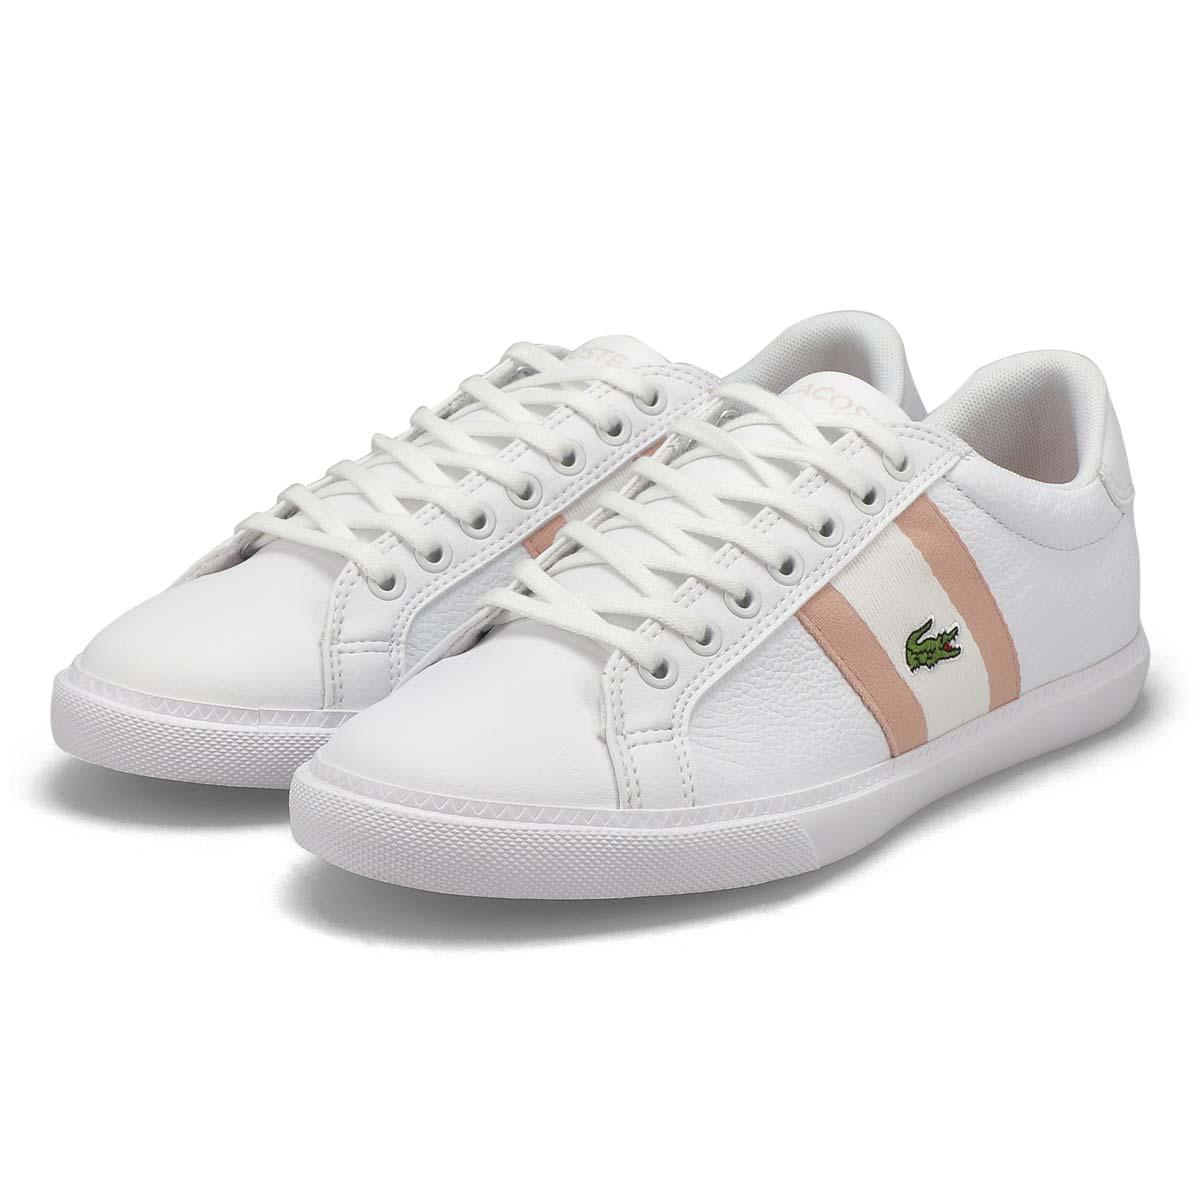 Women's Grad Vulc 120 Sneaker - White/Pink